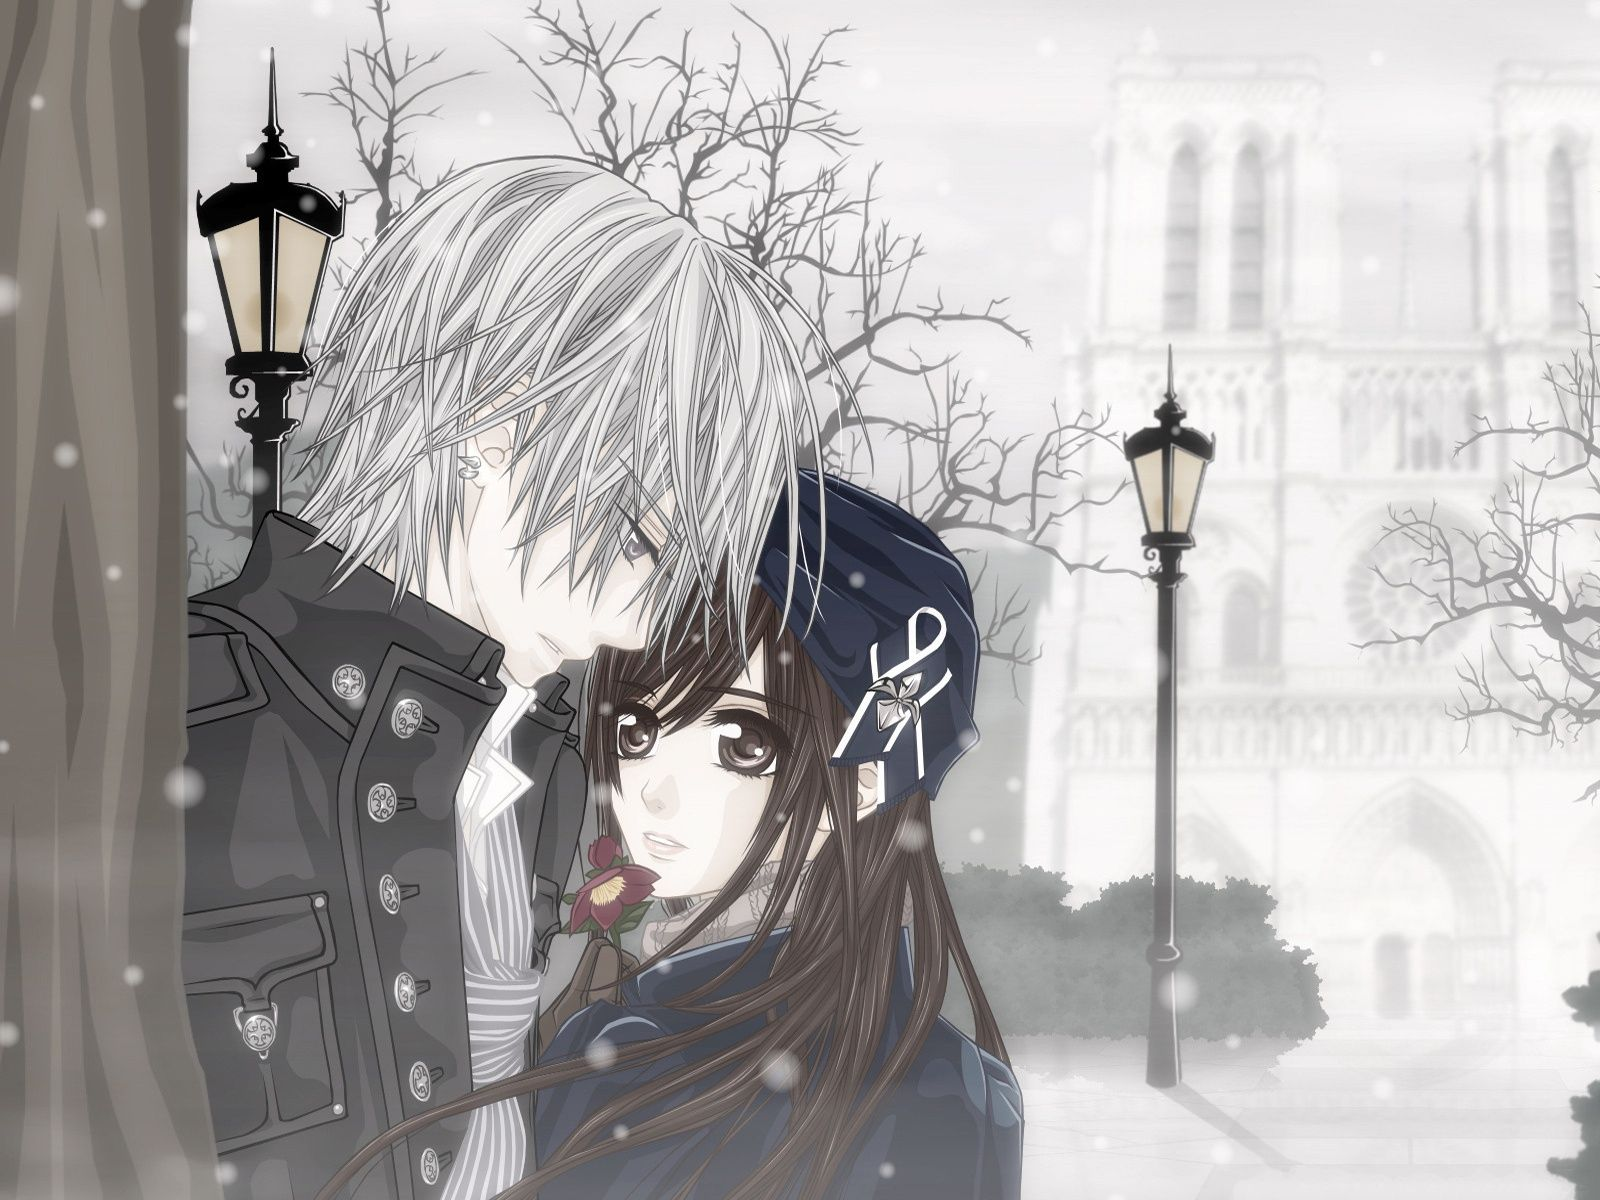 Winter Love Widescreen Background Anime Wallpaper Romantic Anime Vampire Knight